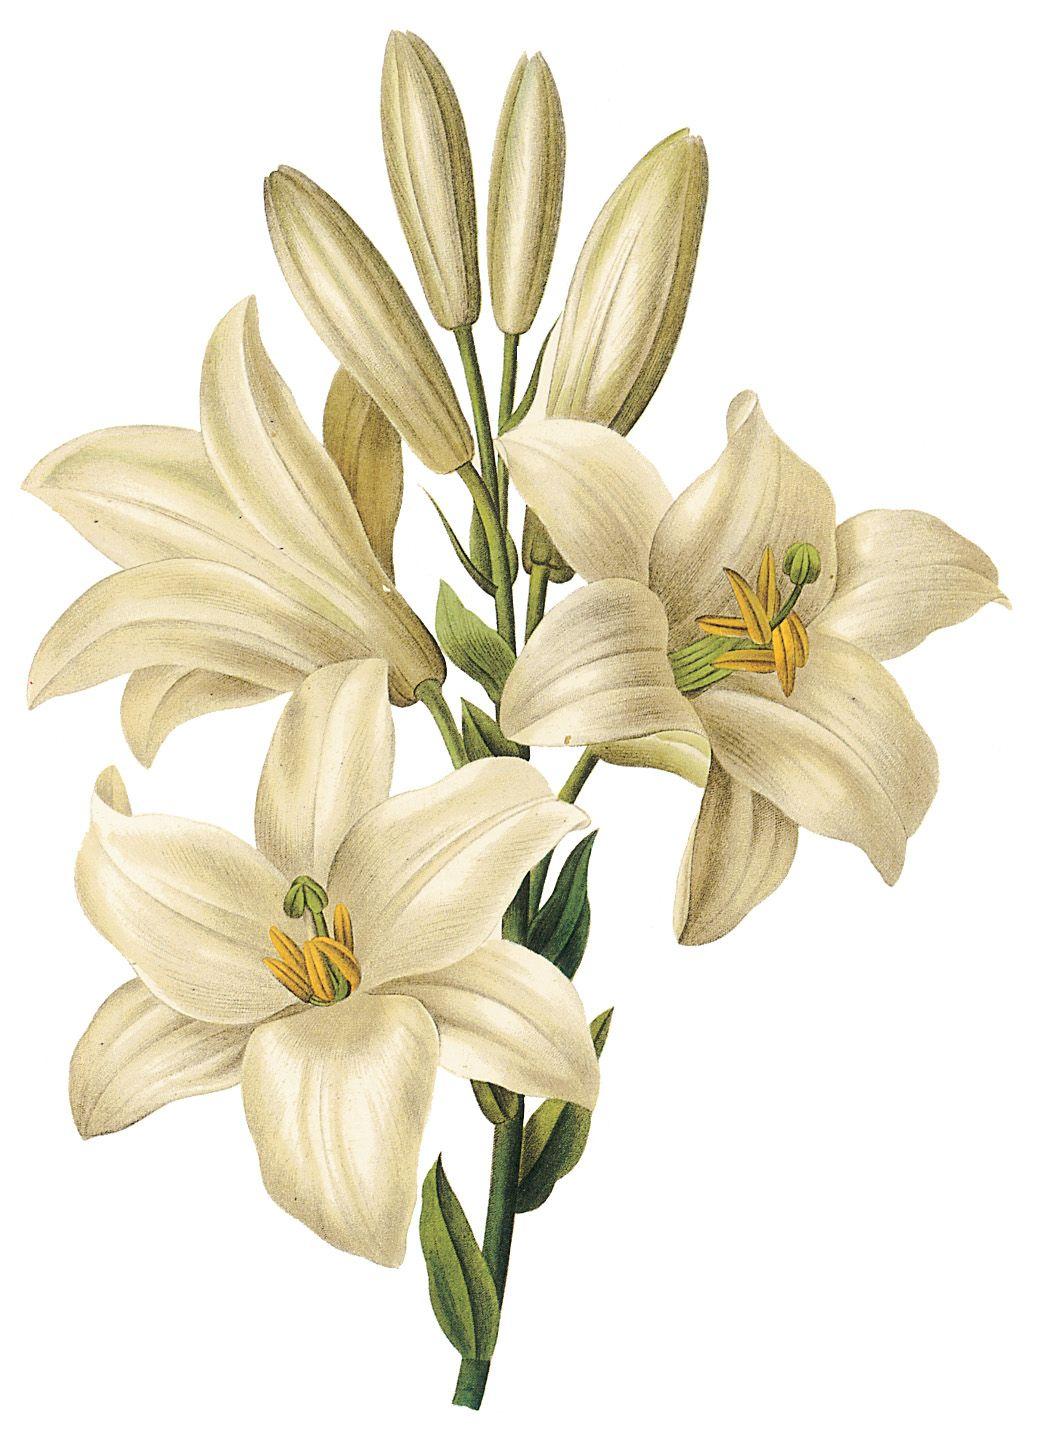 Lbum de imgenes para la inspiracin pinterest white lilies thank you for following my boards please pin all you like mi pinterest es su pinterest izmirmasajfo